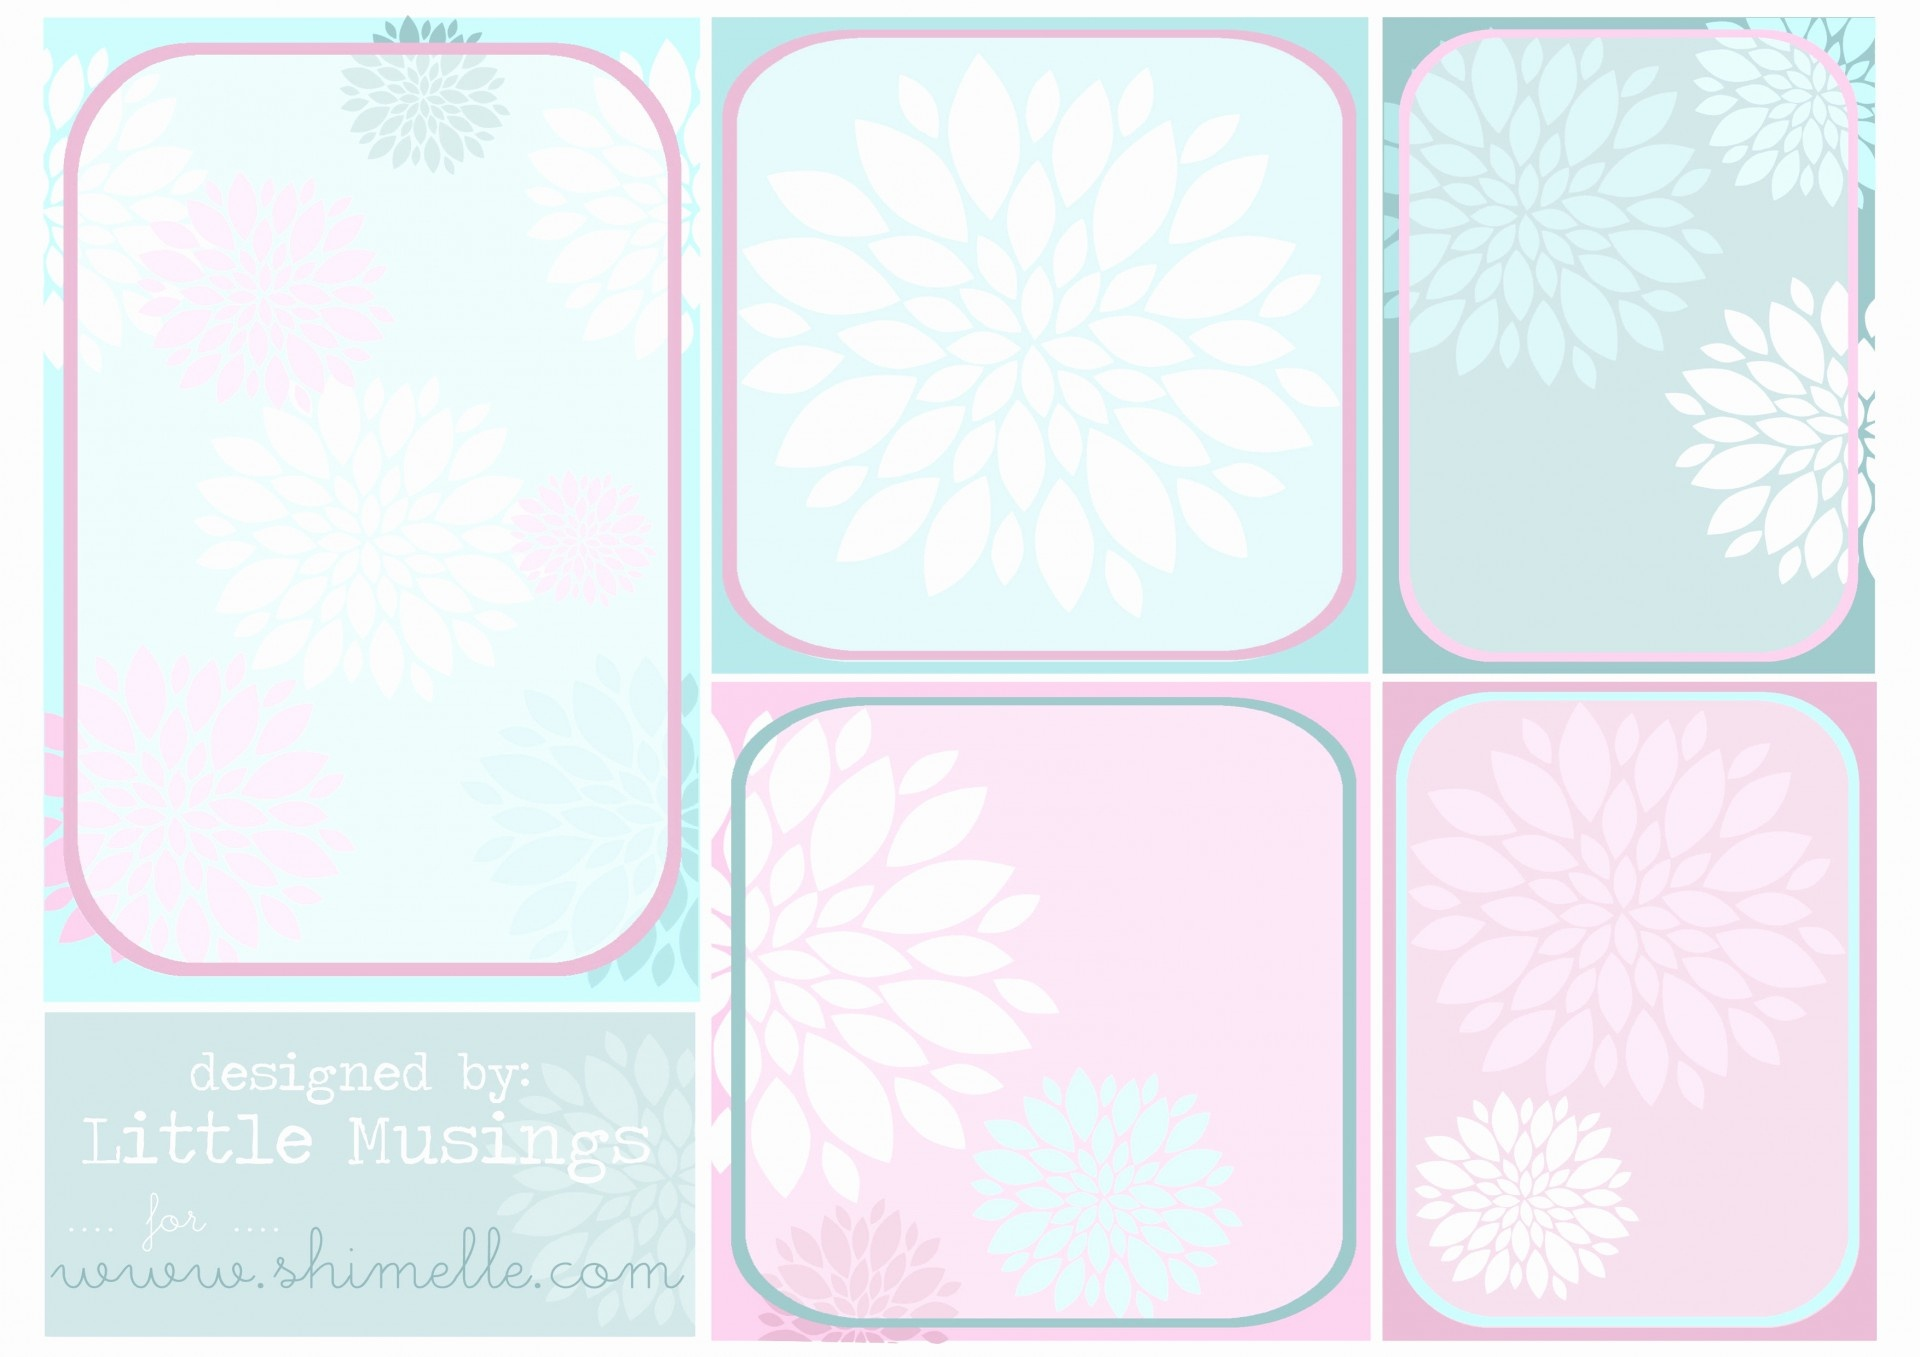 002 Free Printable Scrapbook Templates Fresh Best Pages Line Design - Free Printable Scrapbook Templates